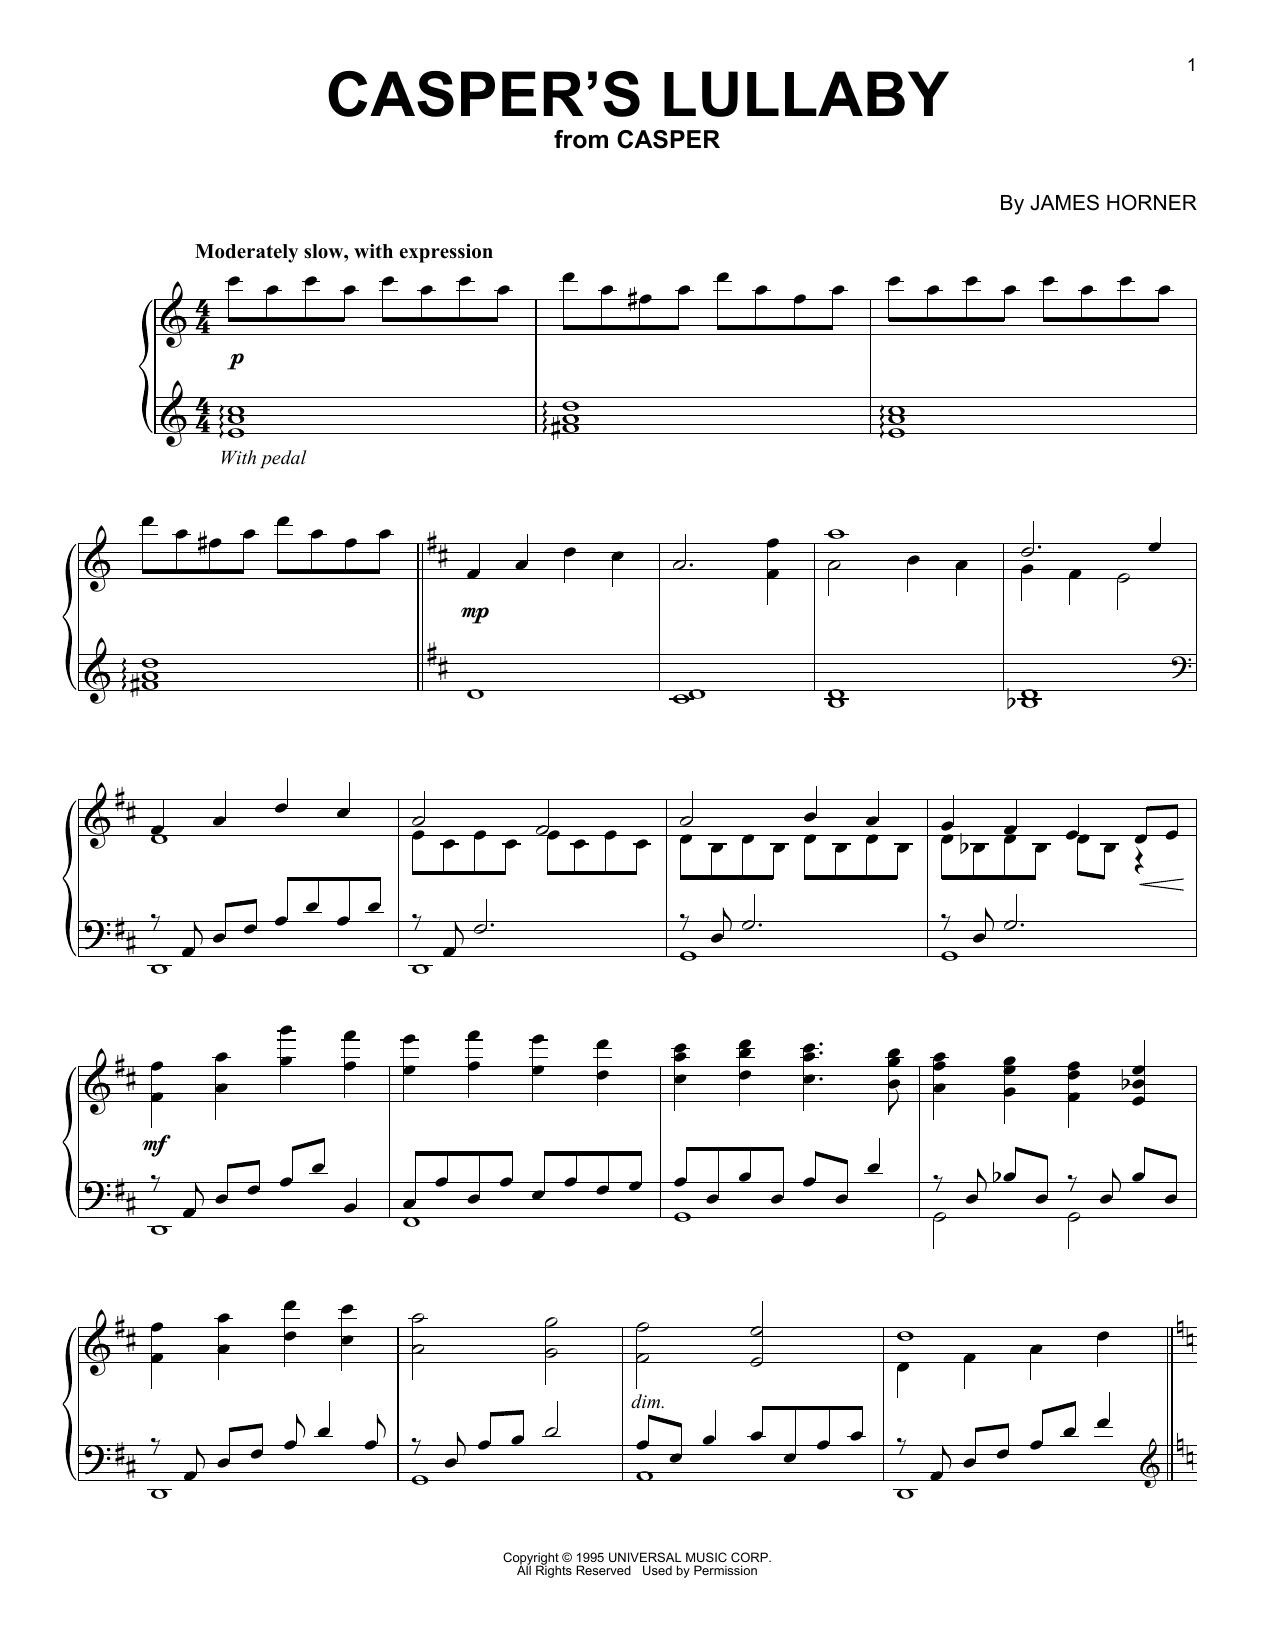 James Horner Casper's Lullaby sheet music notes and chords